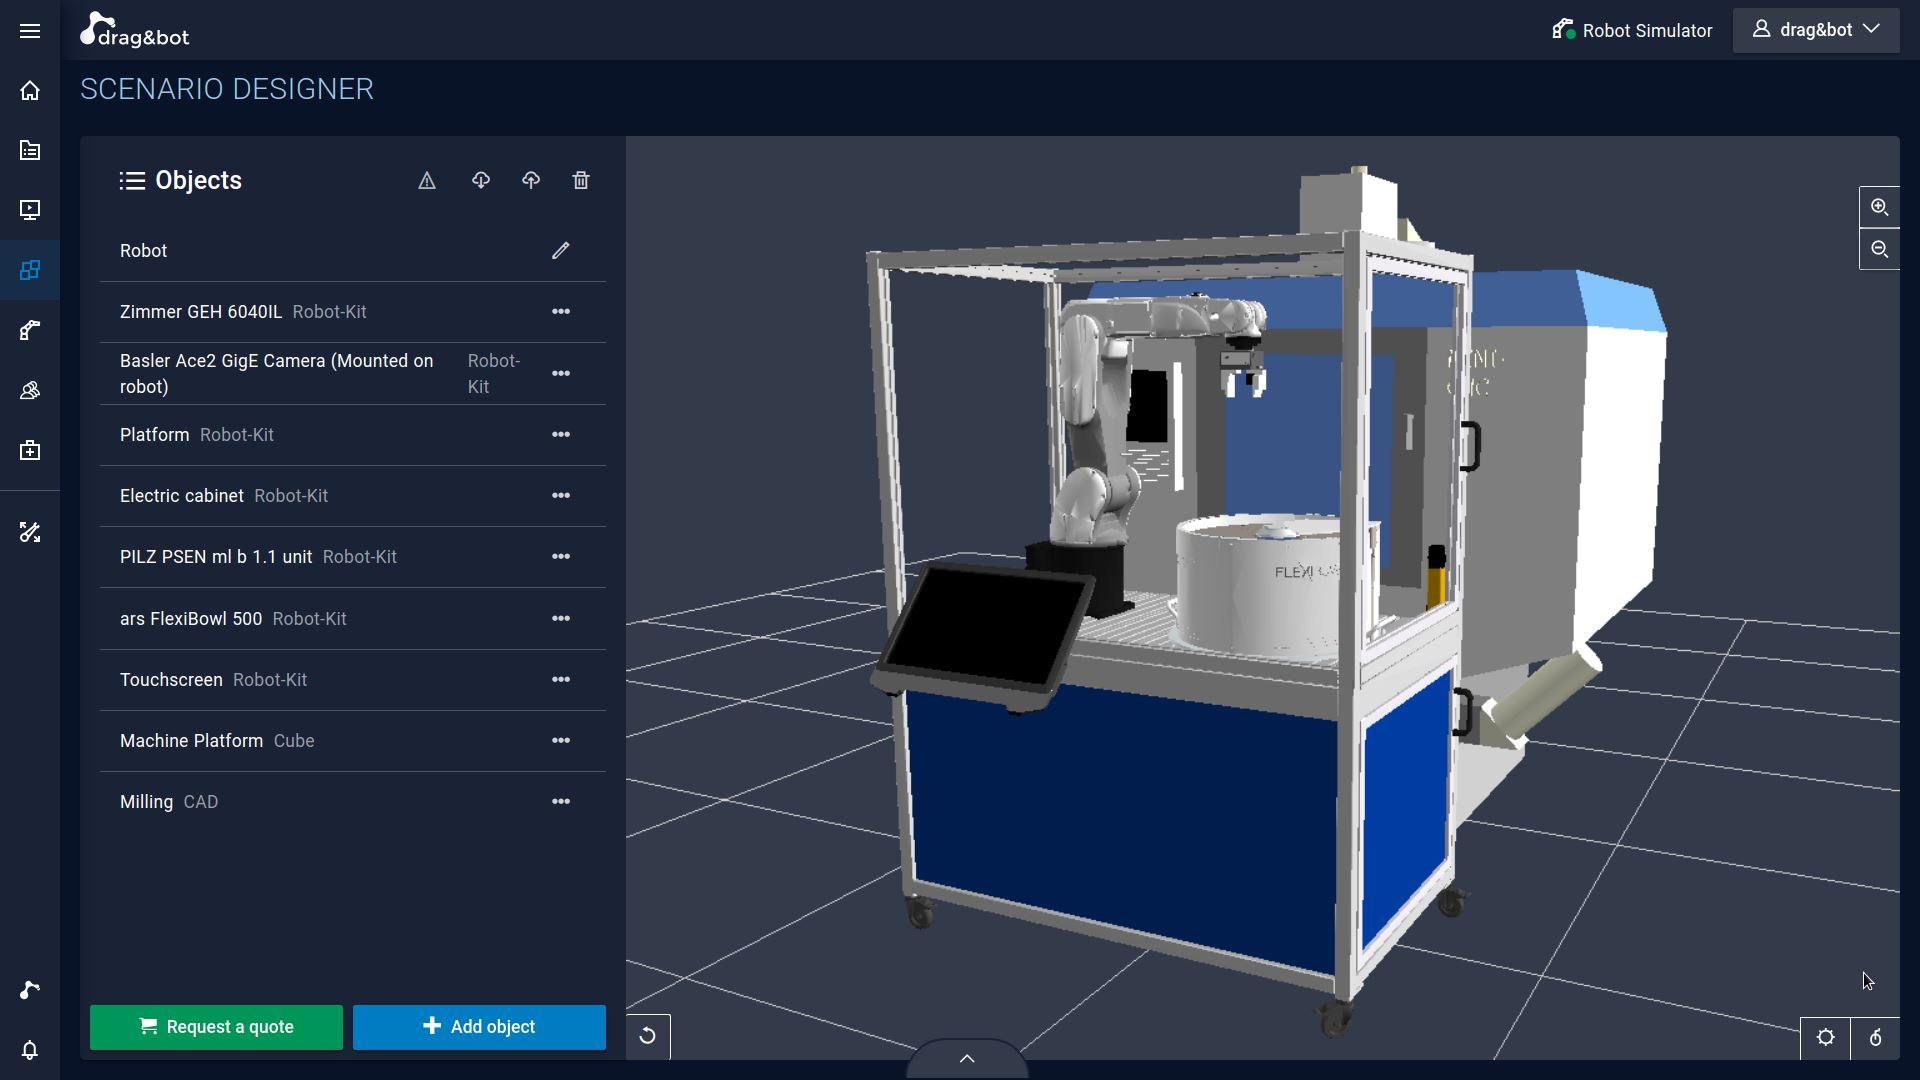 drag&bot Robot-Kit Konfiguration im Scenario Designer